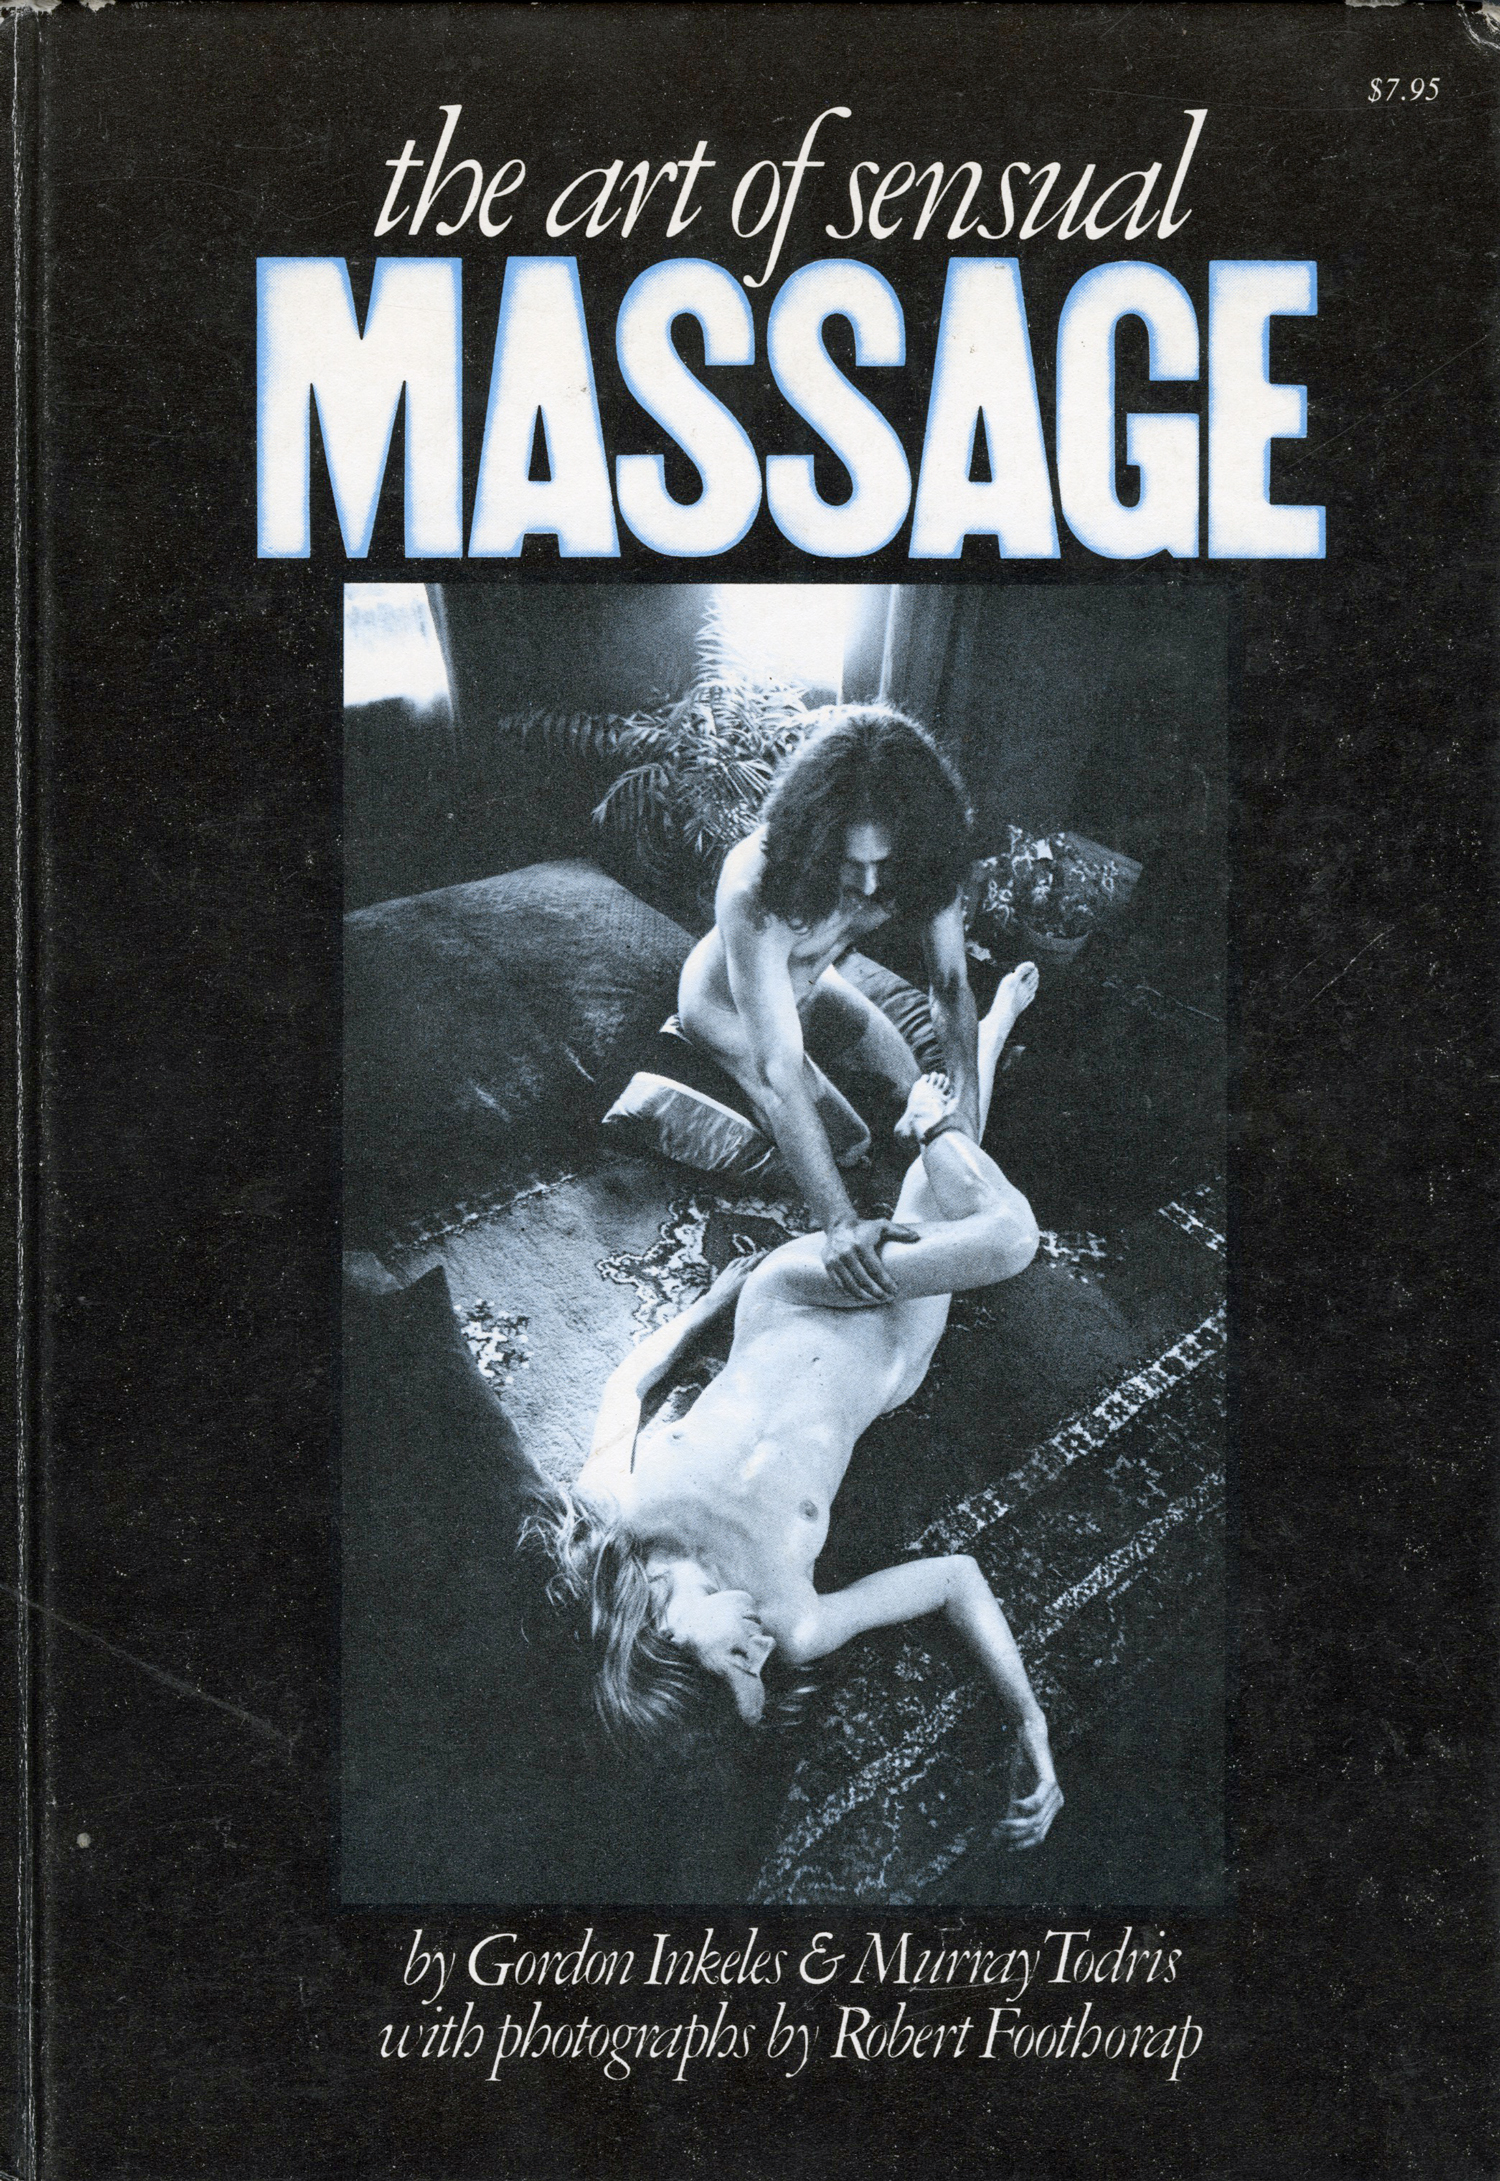 The Art of Sensual Massage, 1972